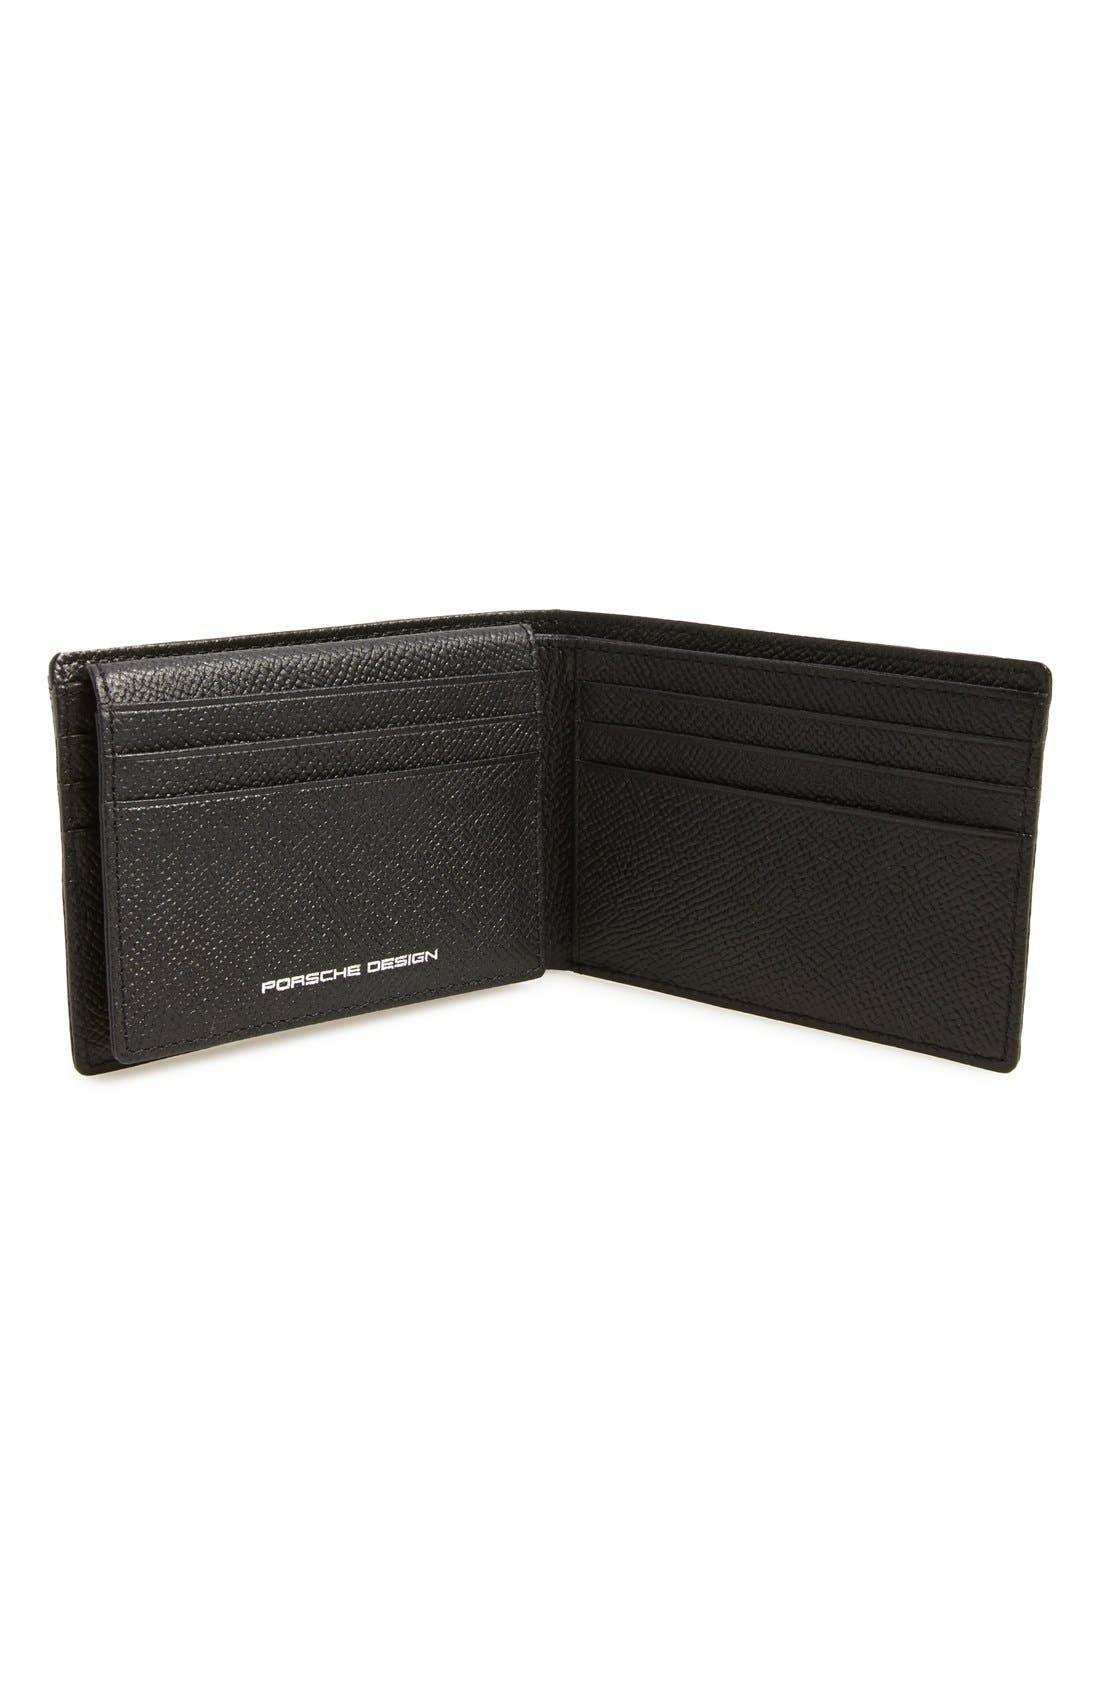 'FC 3.0' Leather L-Fold Wallet,                             Alternate thumbnail 2, color,                             Black